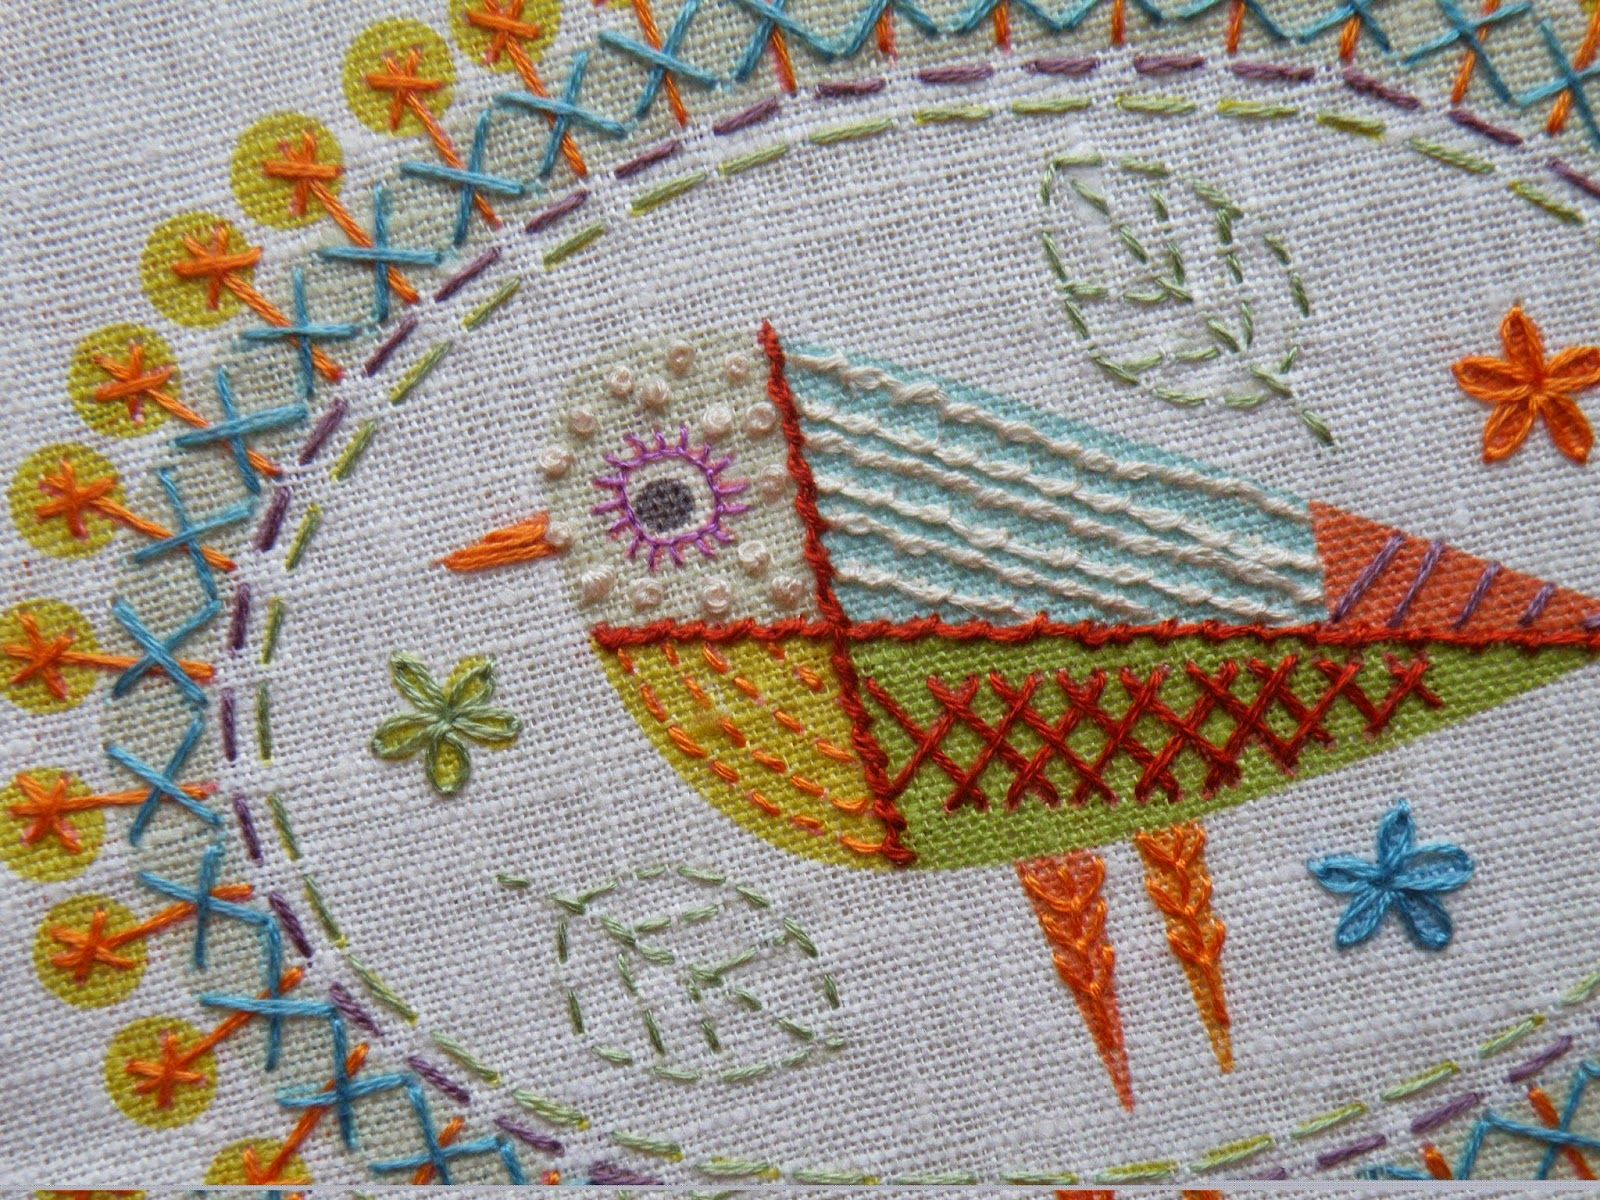 Nancy nicholson birdie embroidery kit detail